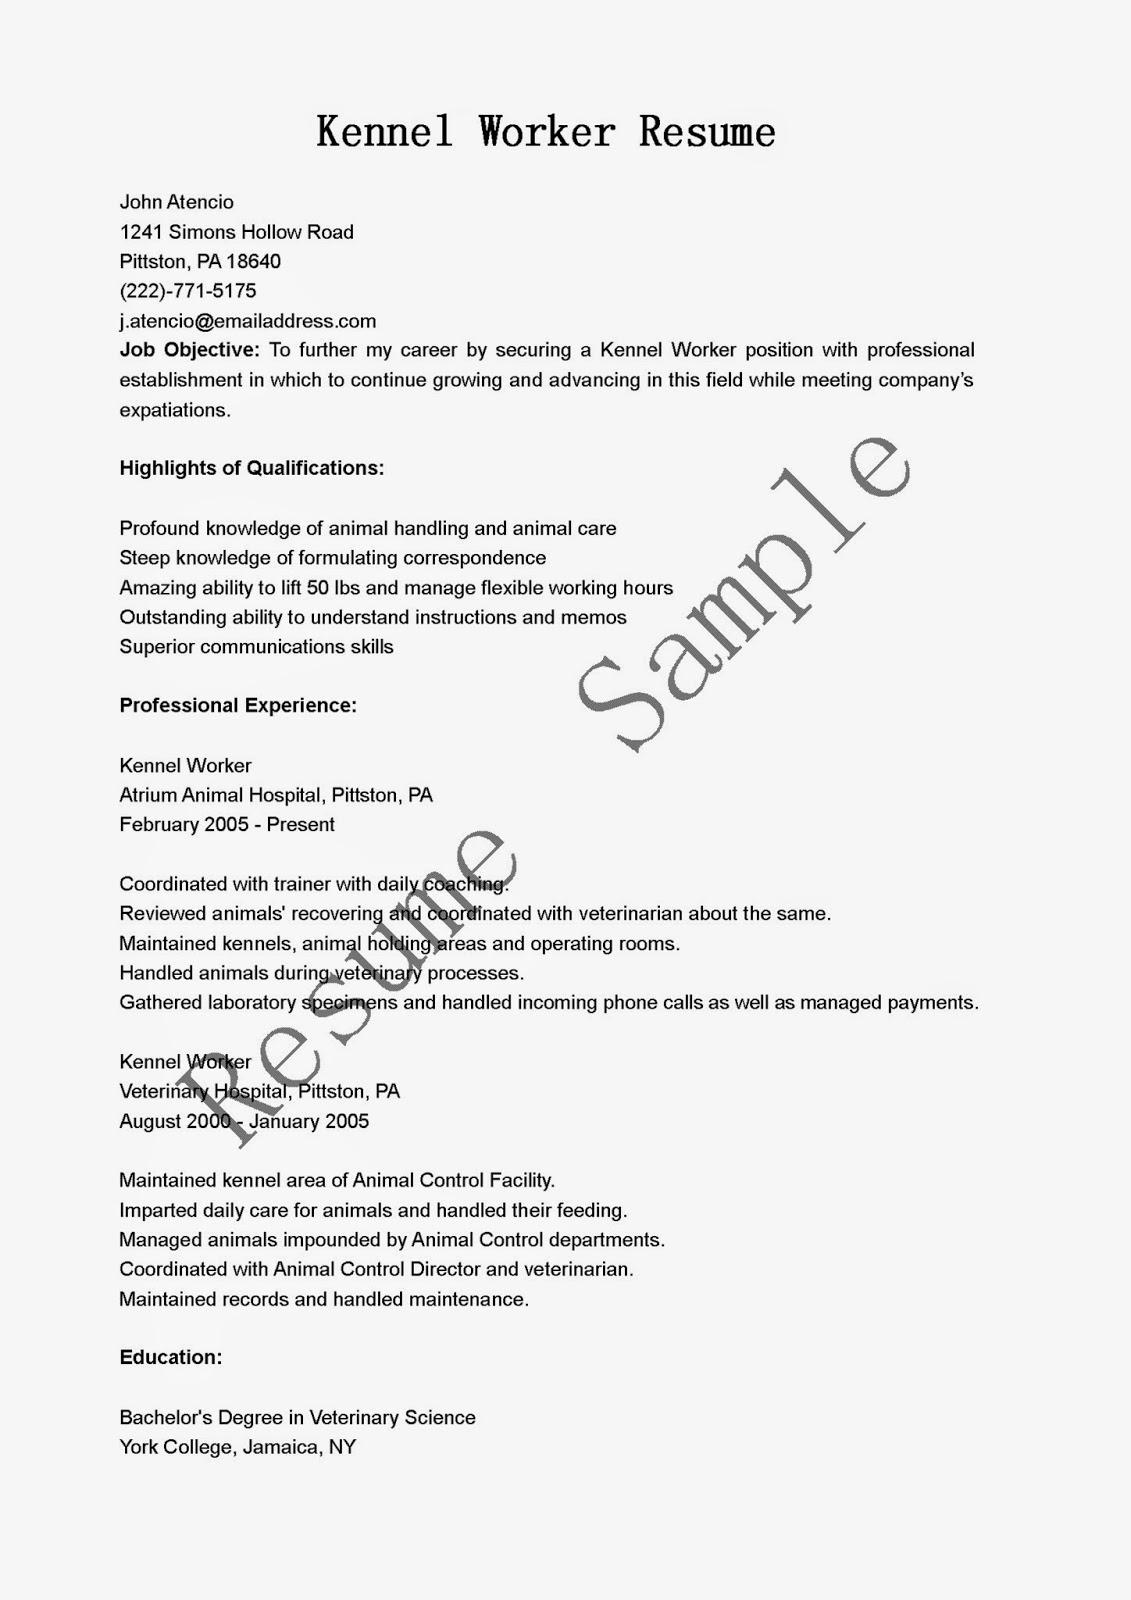 Cover Letter Sample Jamaica | Application Letter Format In Jamaica ...